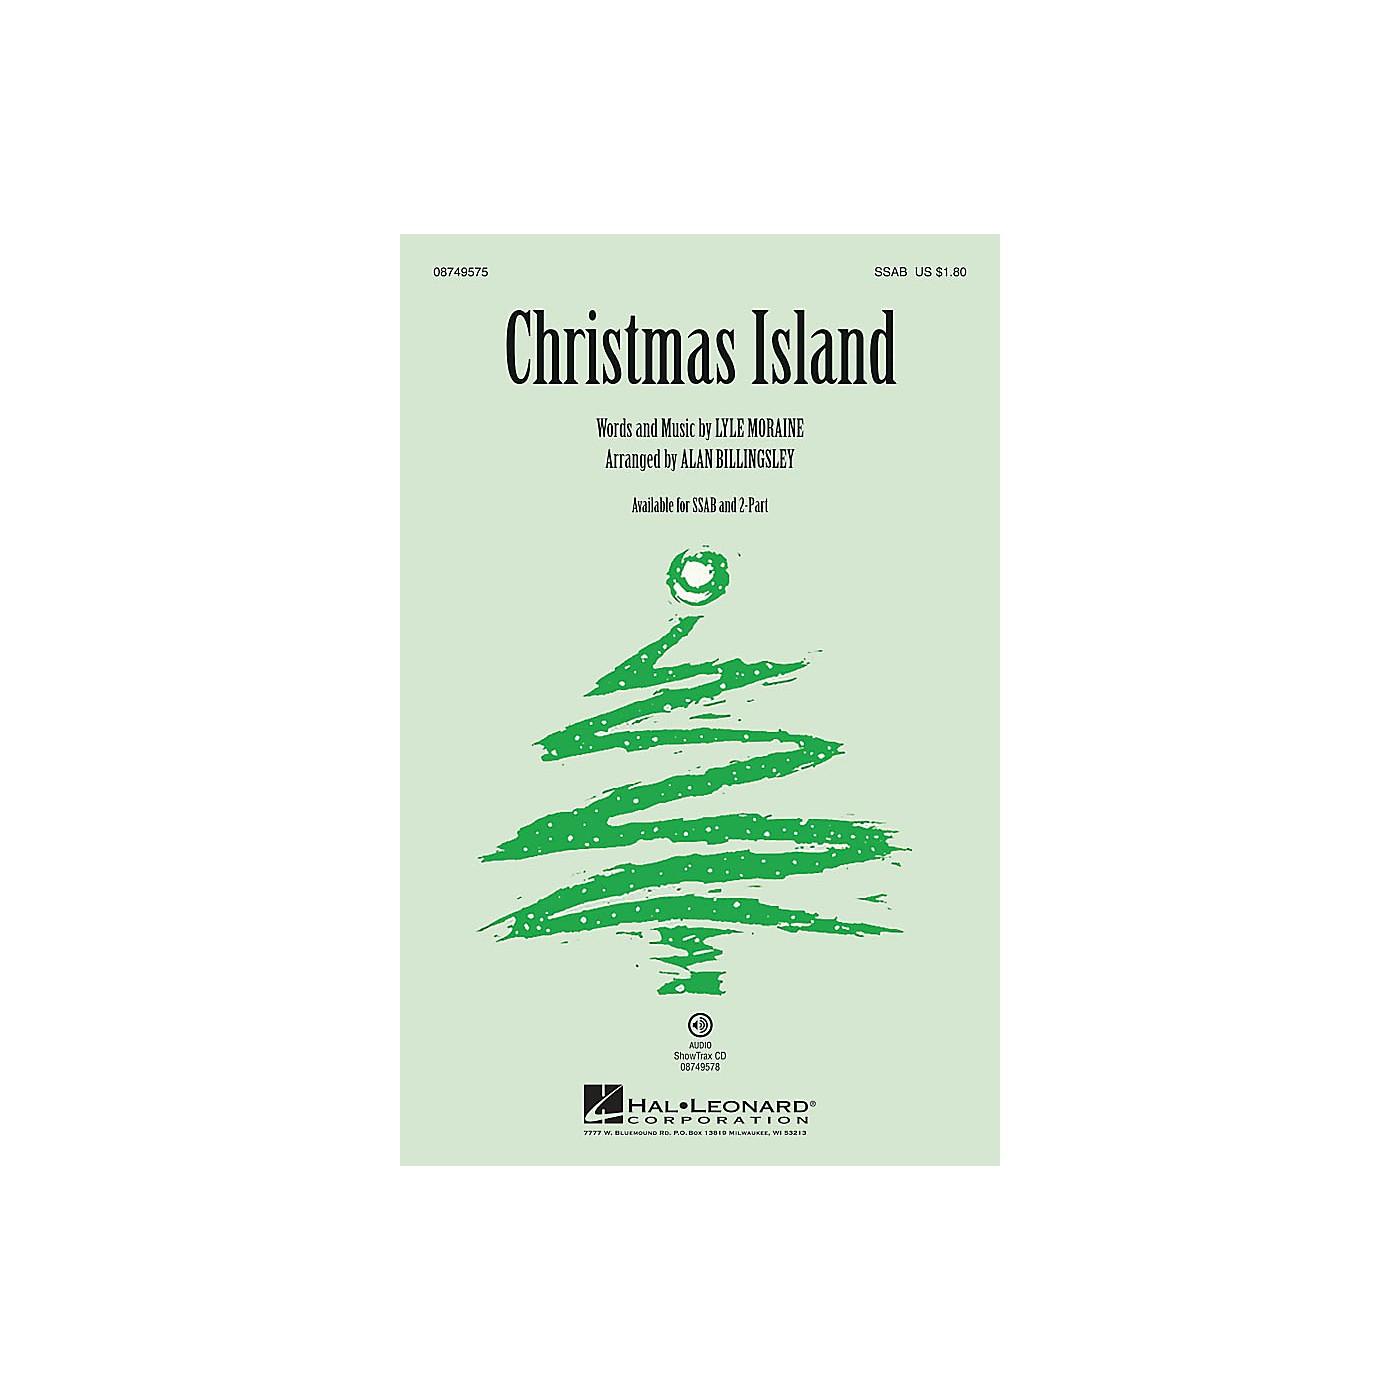 Hal Leonard Christmas Island ShowTrax CD by Brian Setzer Arranged by Alan Billingsley thumbnail